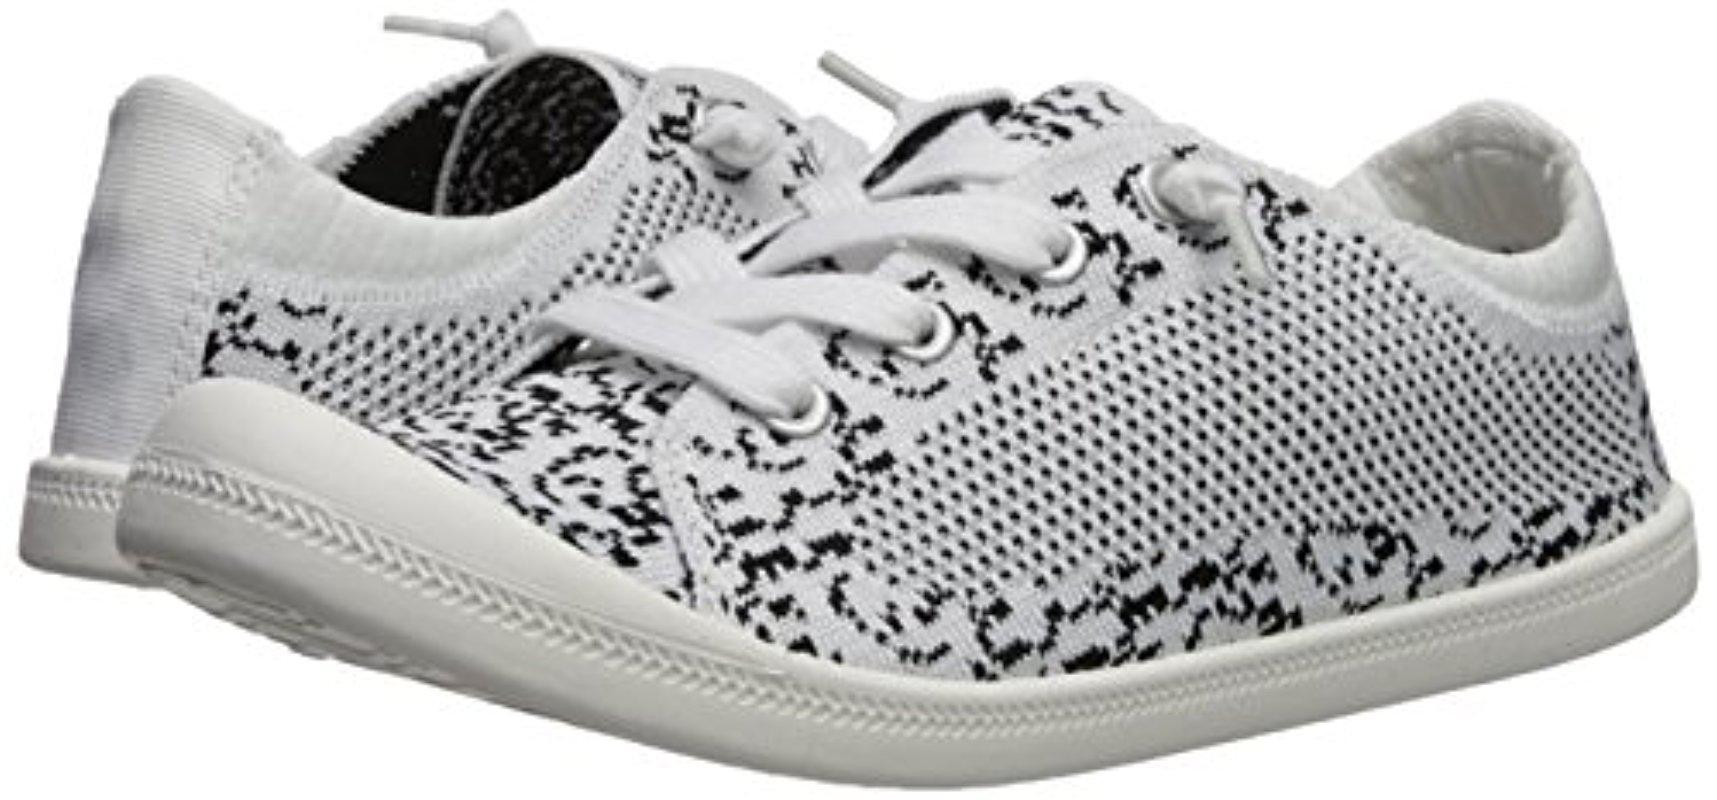 Madden Girl Canvas Bailey-k Sneaker in